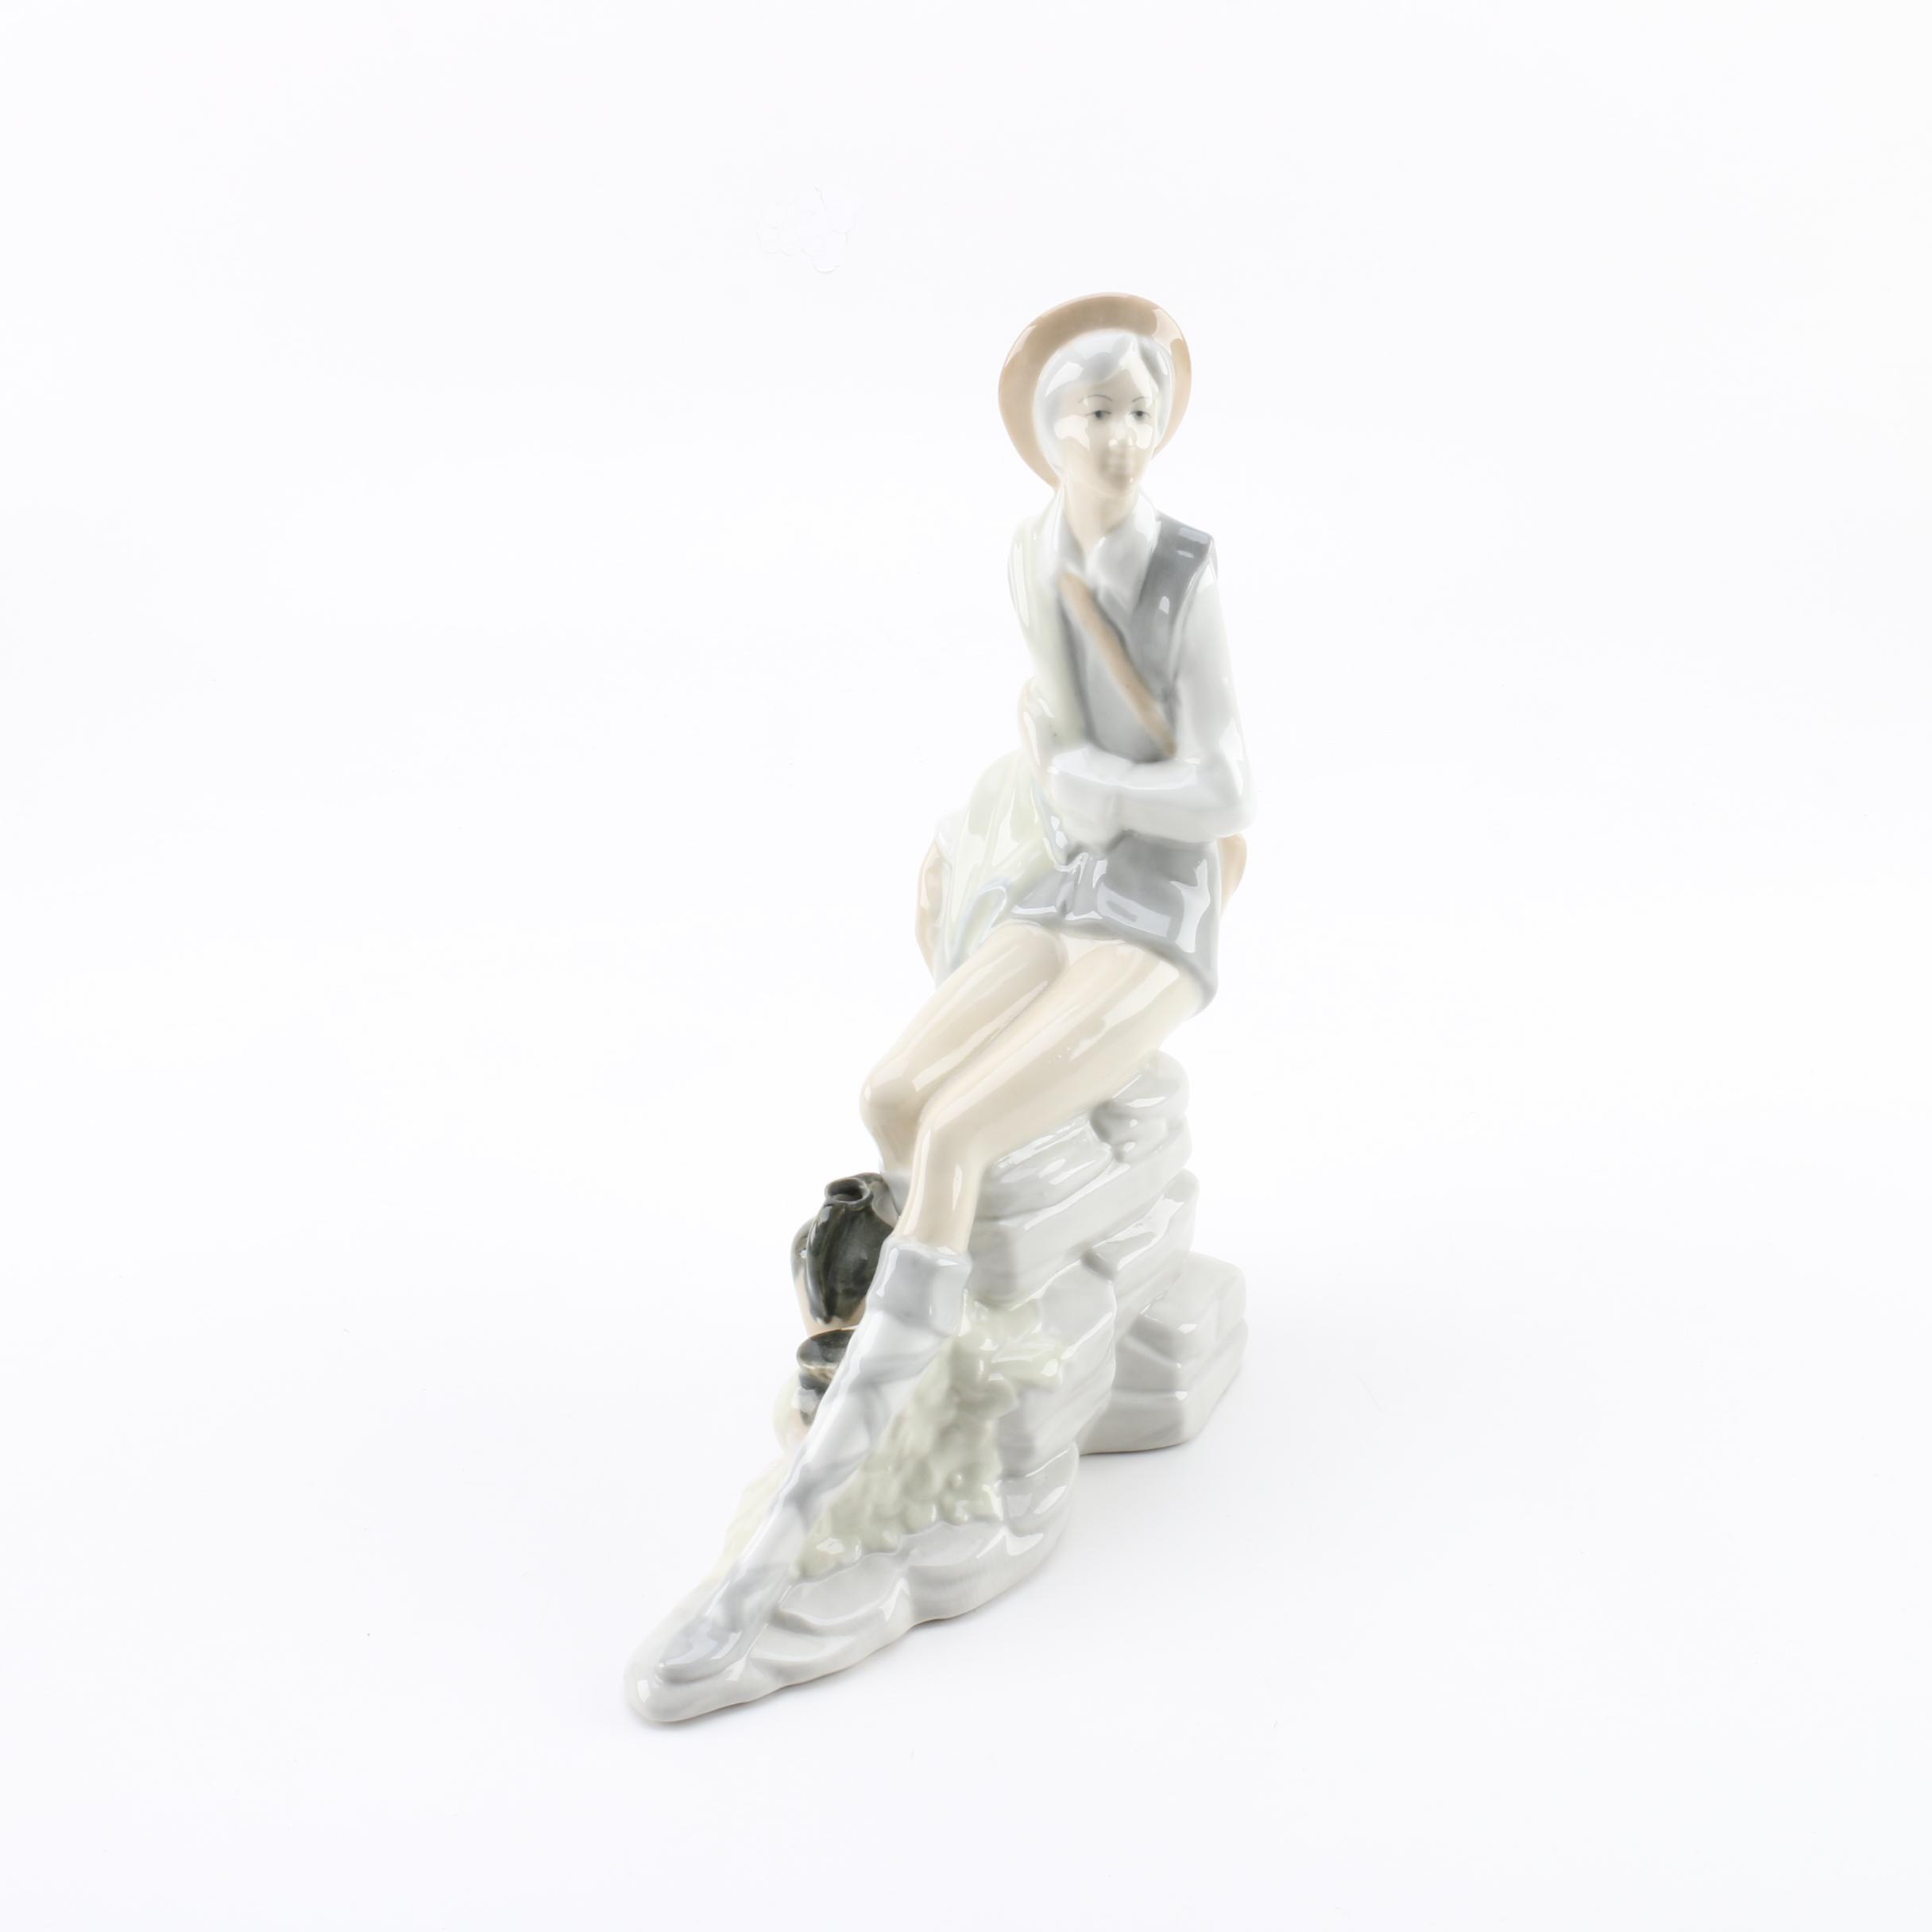 Spanish D'Art SA Porcelain Figurine of Seated Woman